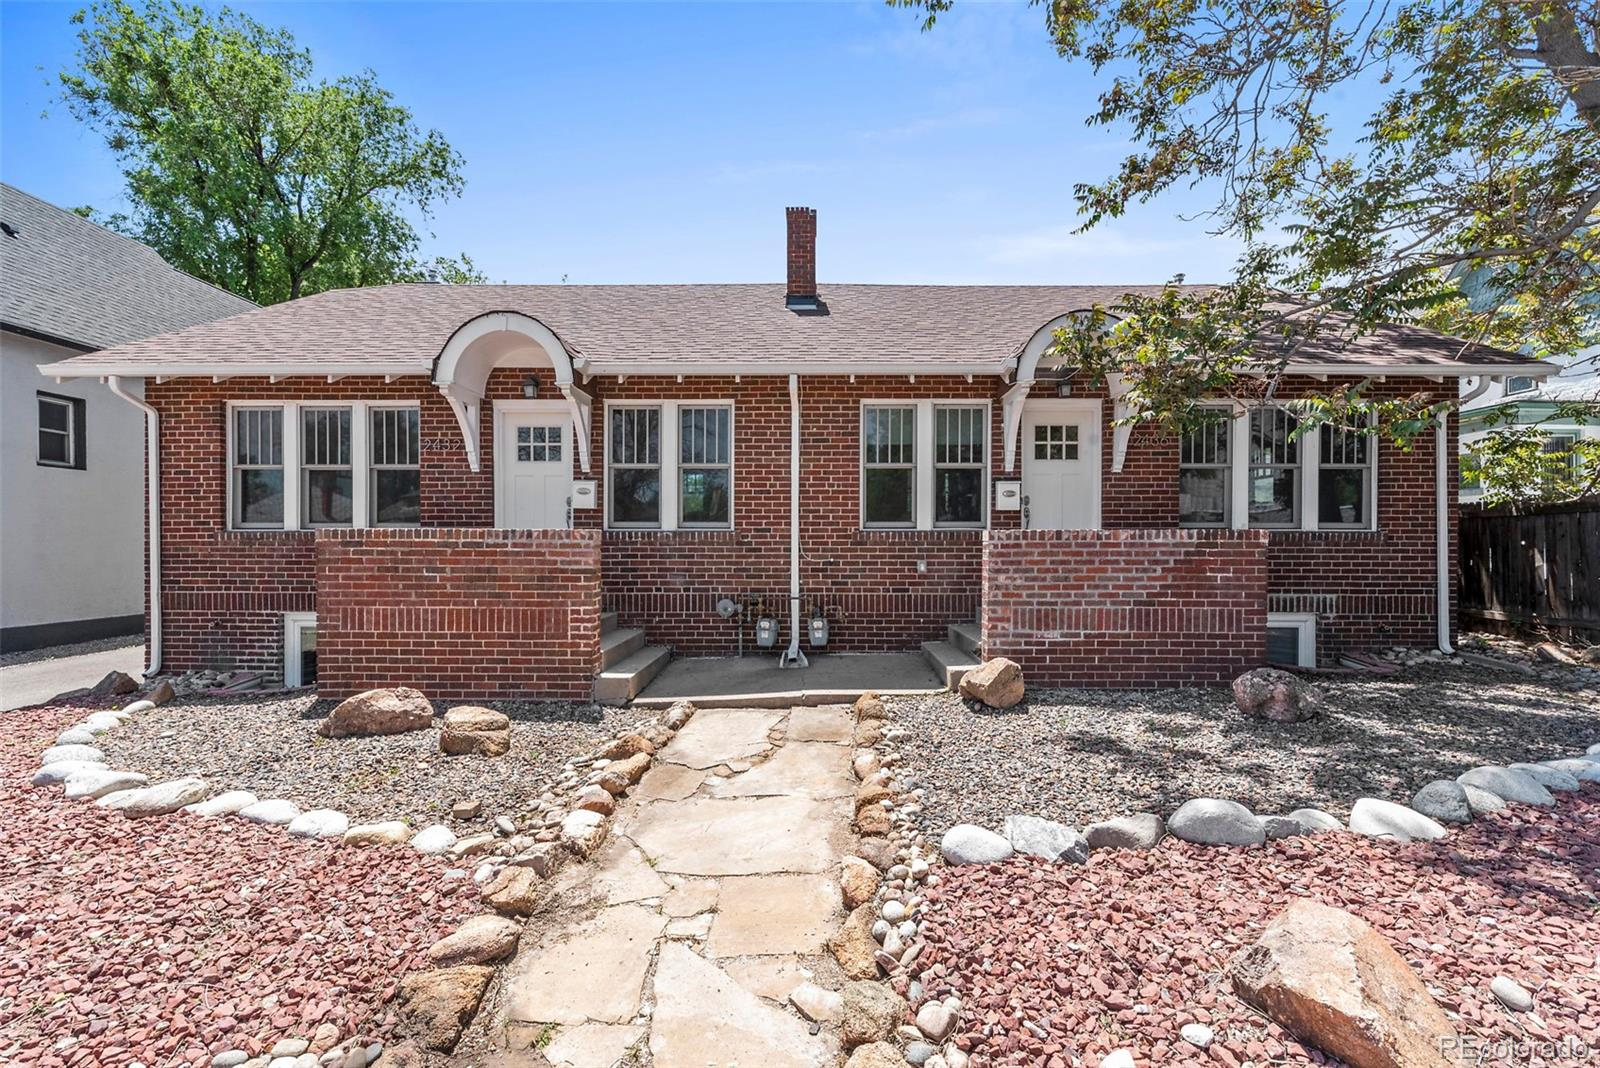 2432 W 38th Avenue Property Photo - Denver, CO real estate listing